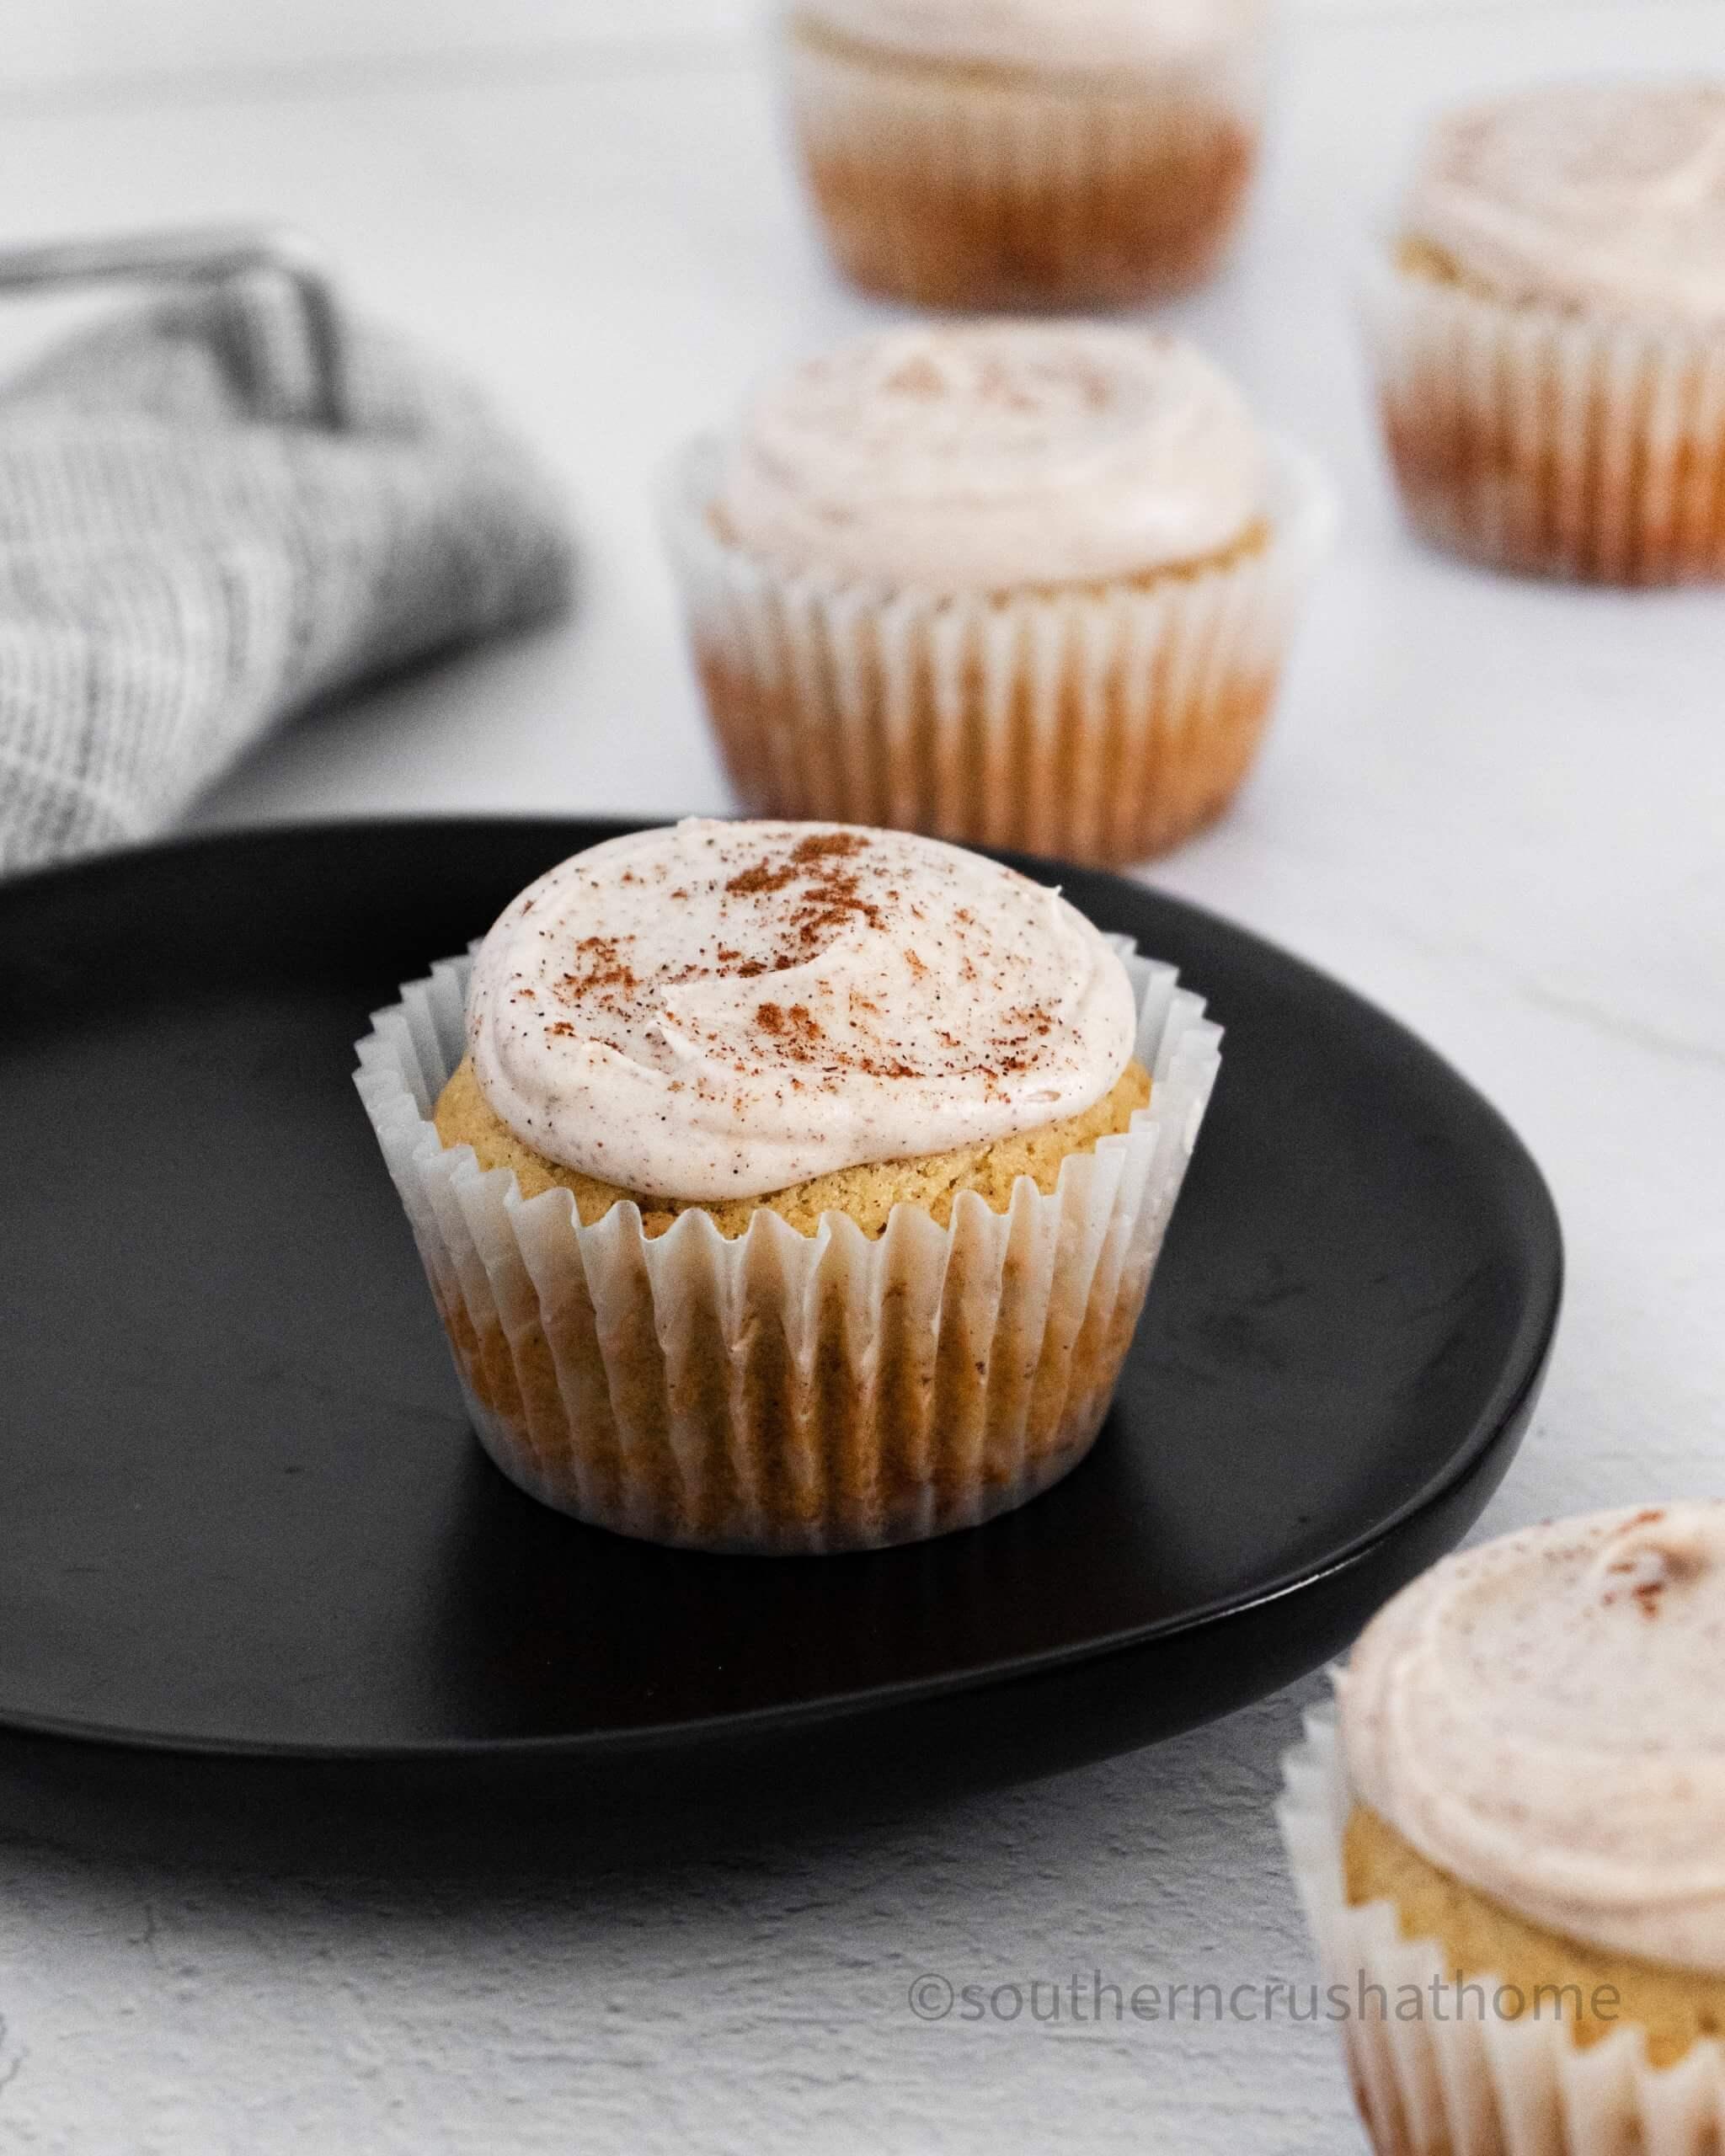 Cinnamon & Vanilla Bean Cupcakes final styled